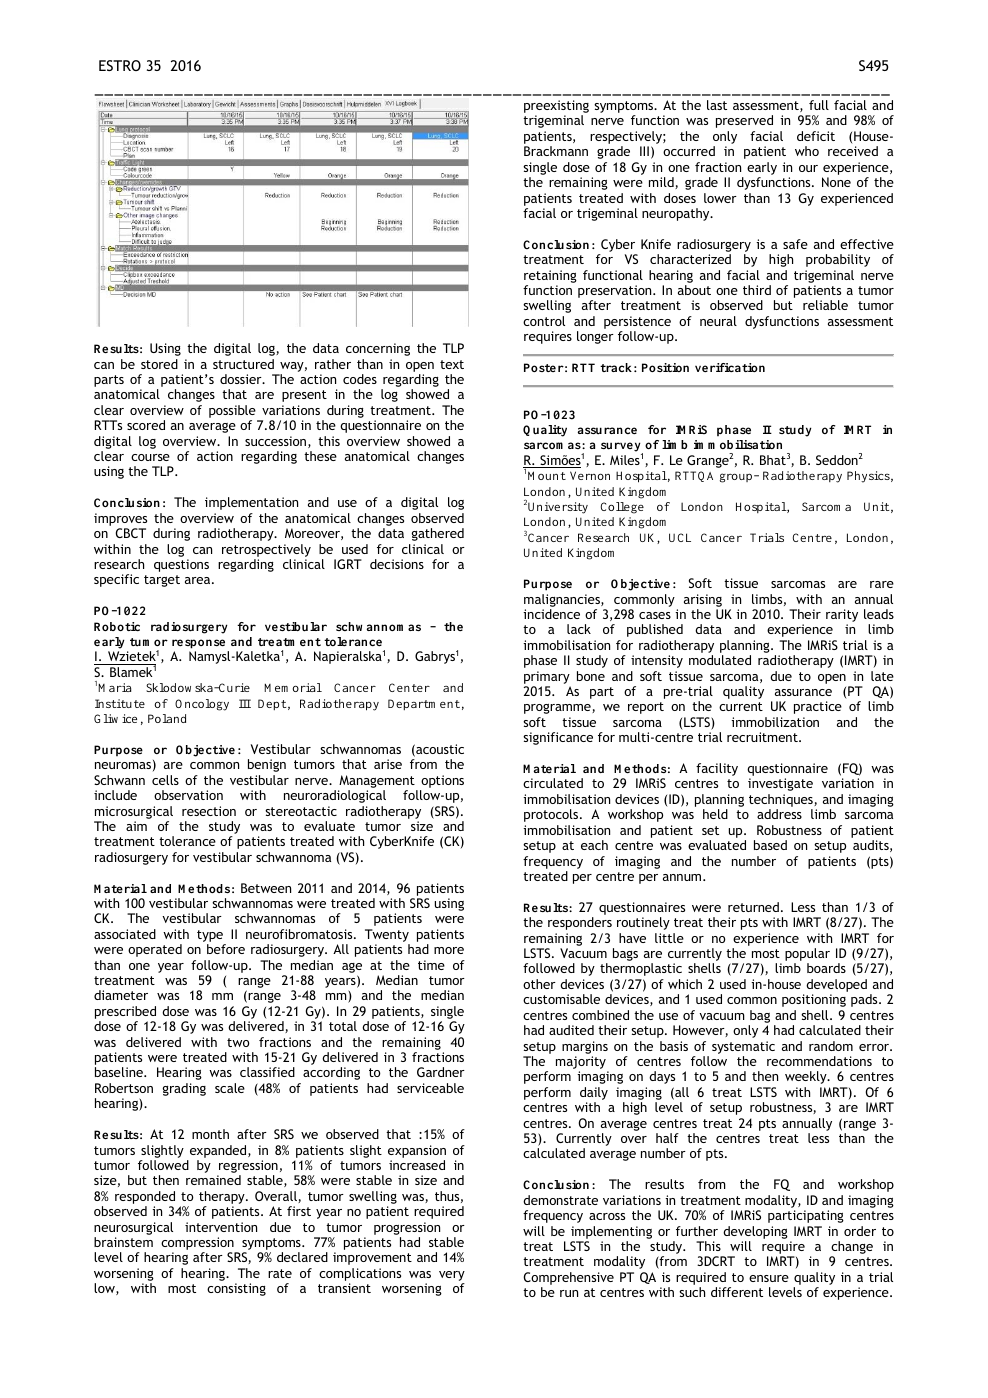 PO-1023: Quality assurance for IMRiS phase II study of IMRT